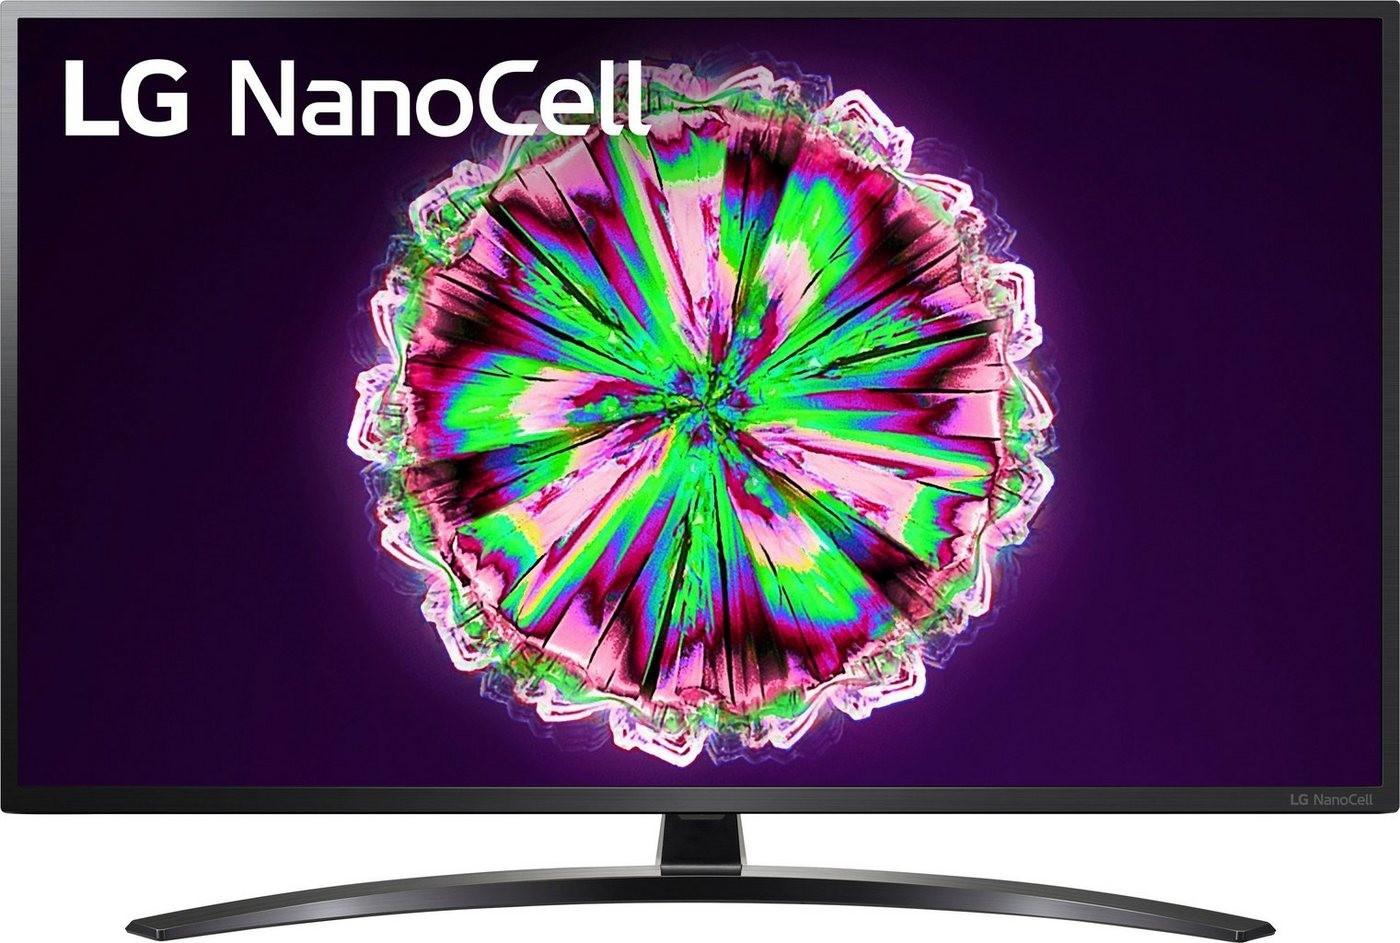 "TV 55"" LG NanoCell 55NANO796NE - 4K UHD, HDR 10, LED, Smart TV"